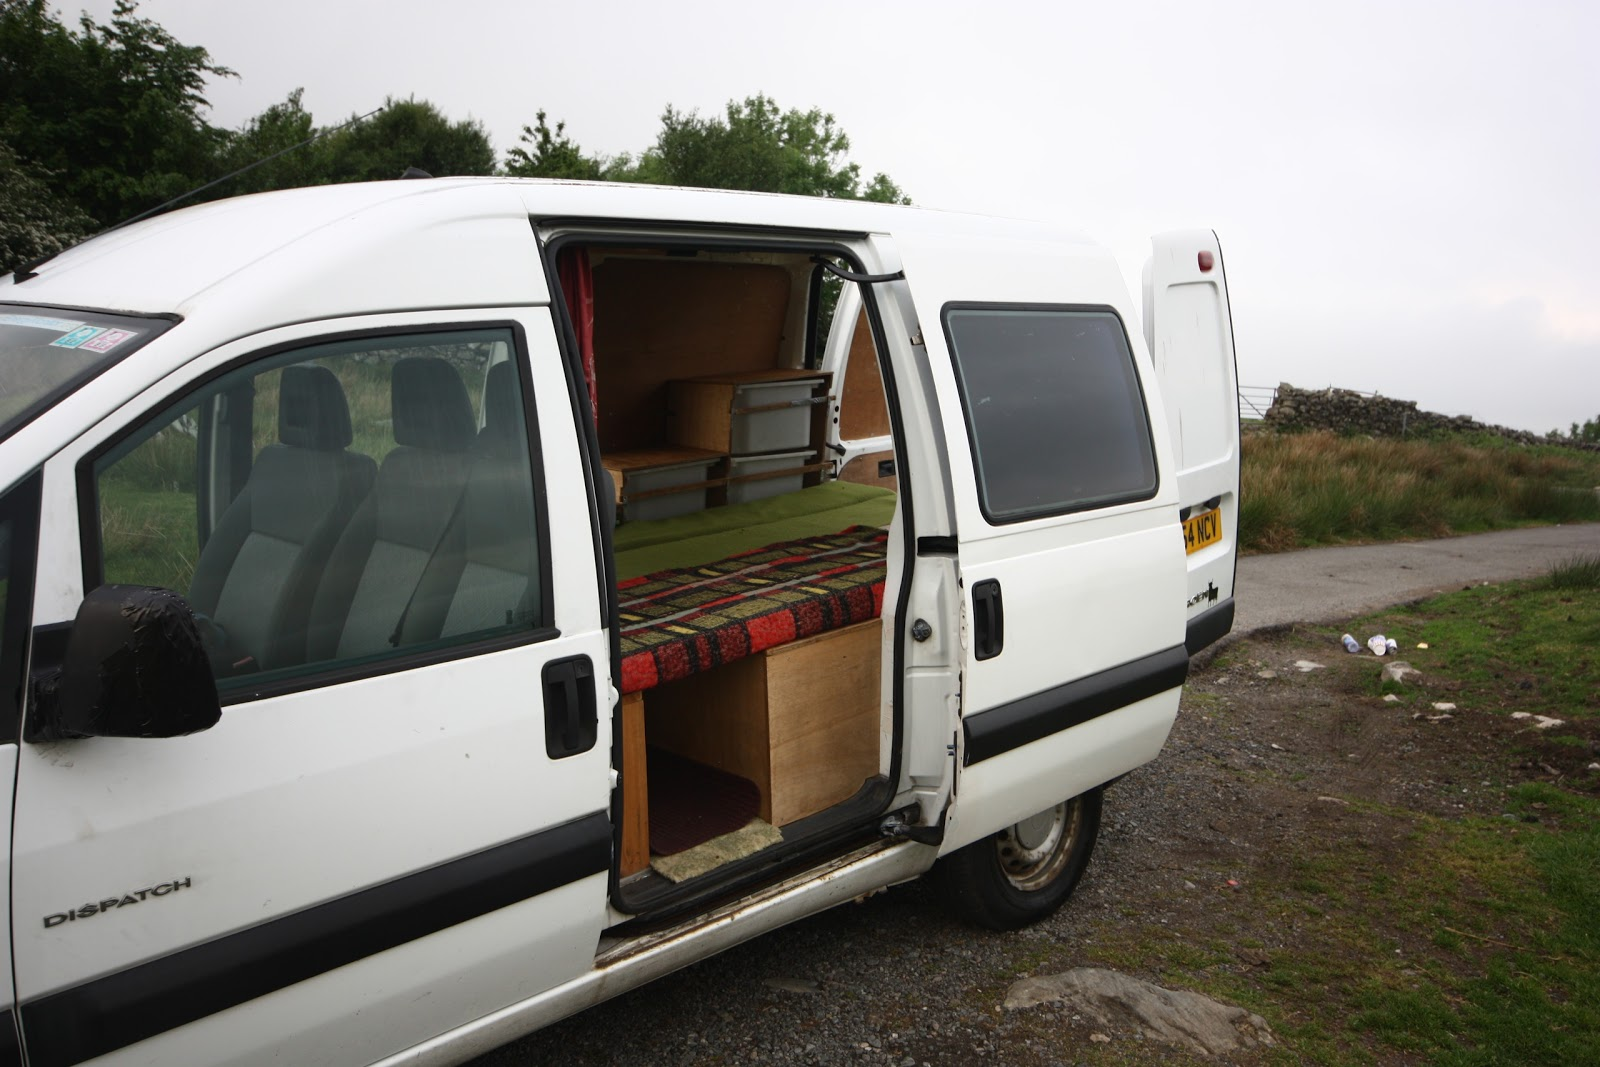 zero carbon adventures sold citroen dispatch campervan. Black Bedroom Furniture Sets. Home Design Ideas